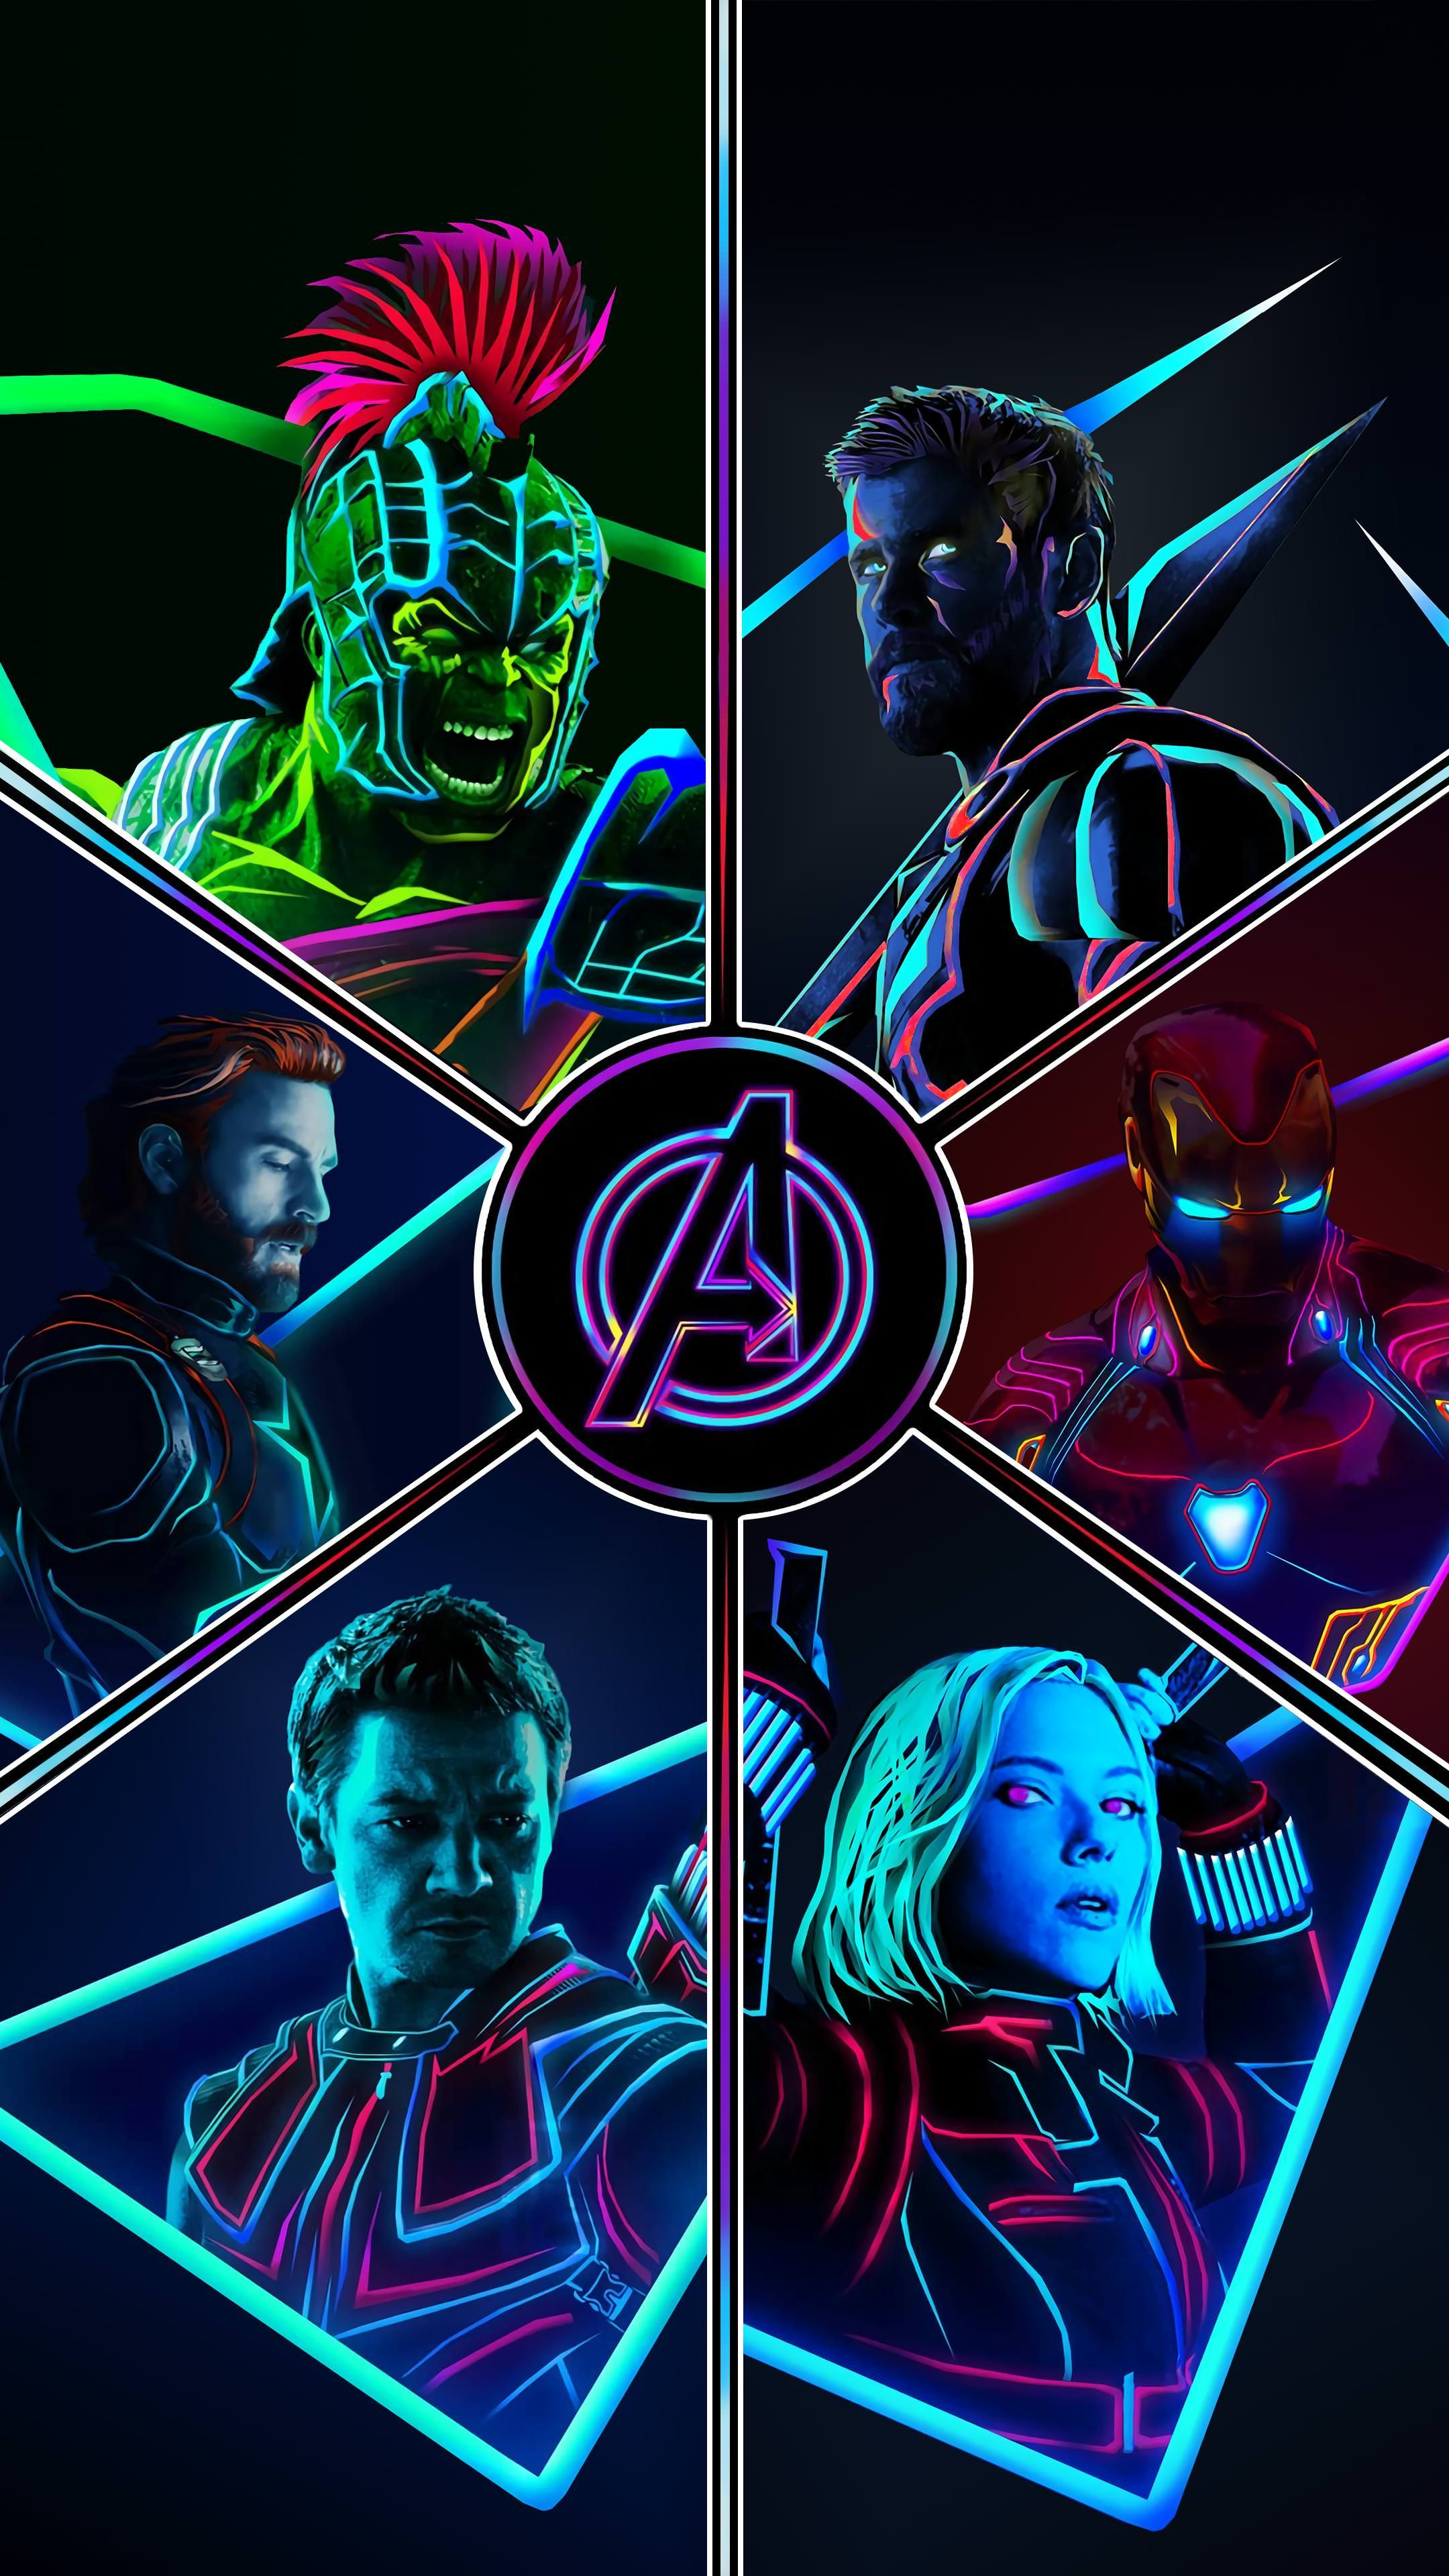 Avengers Neon Wallpaper 4k 2160x3840 Download Hd Wallpaper Wallpapertip